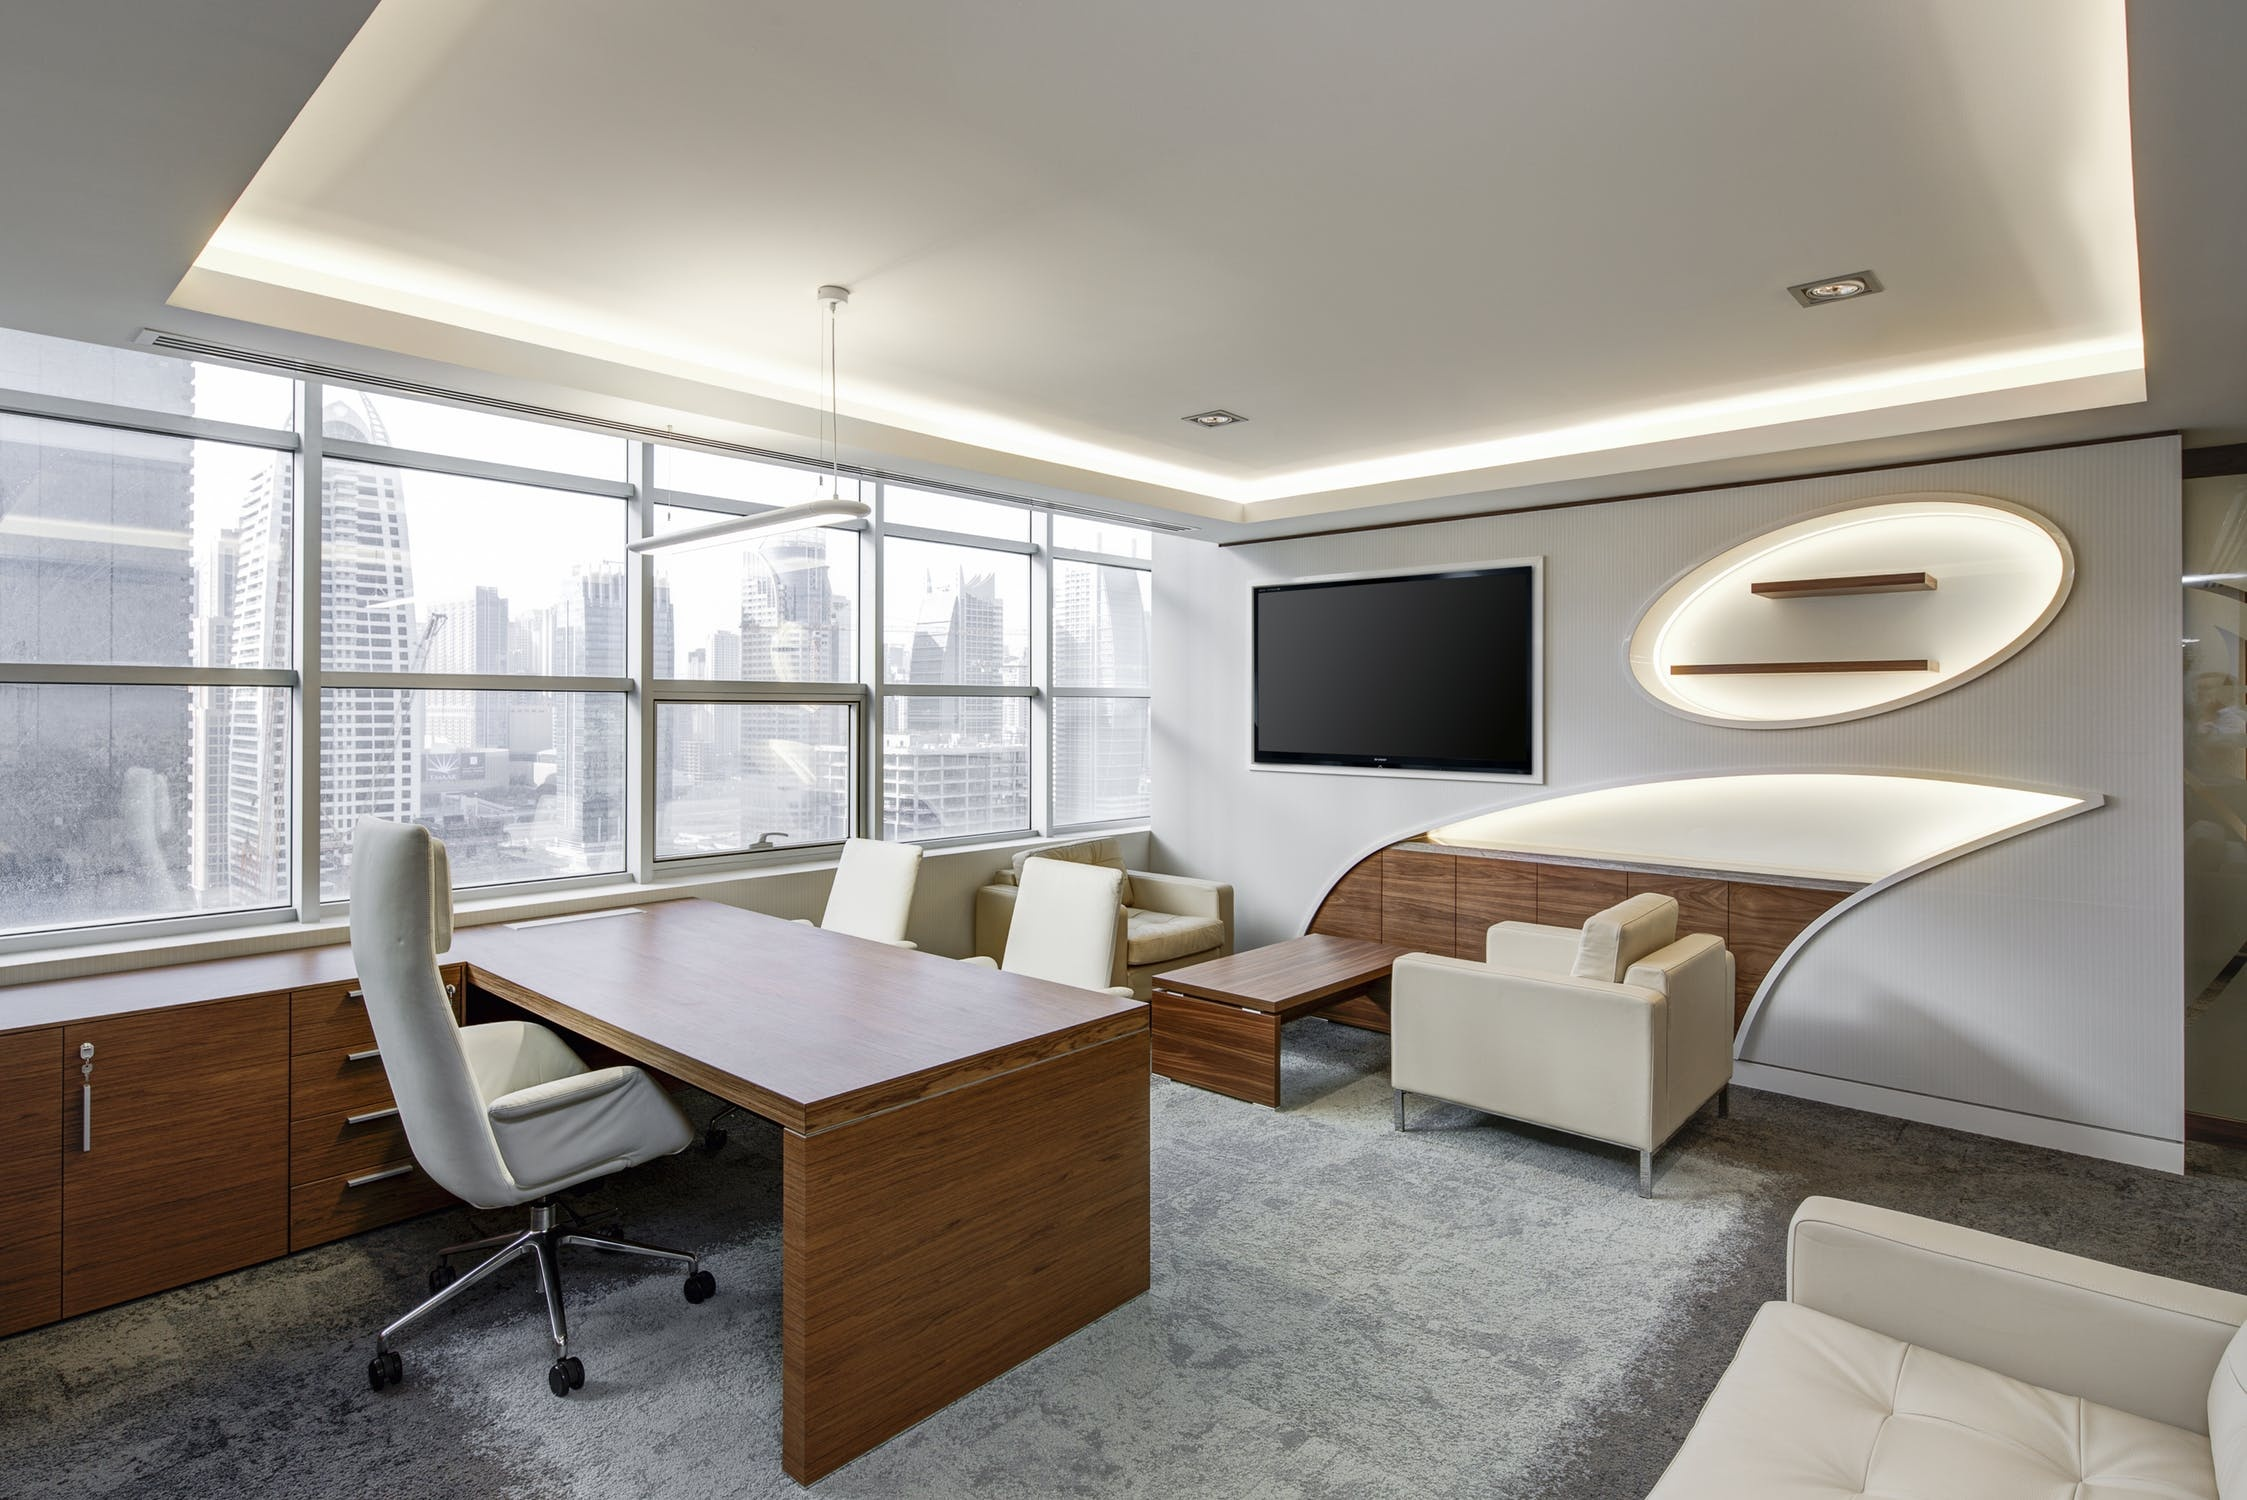 For Office Furniture : Best Online Office Furniture Stores Furniture Palace  Kenya